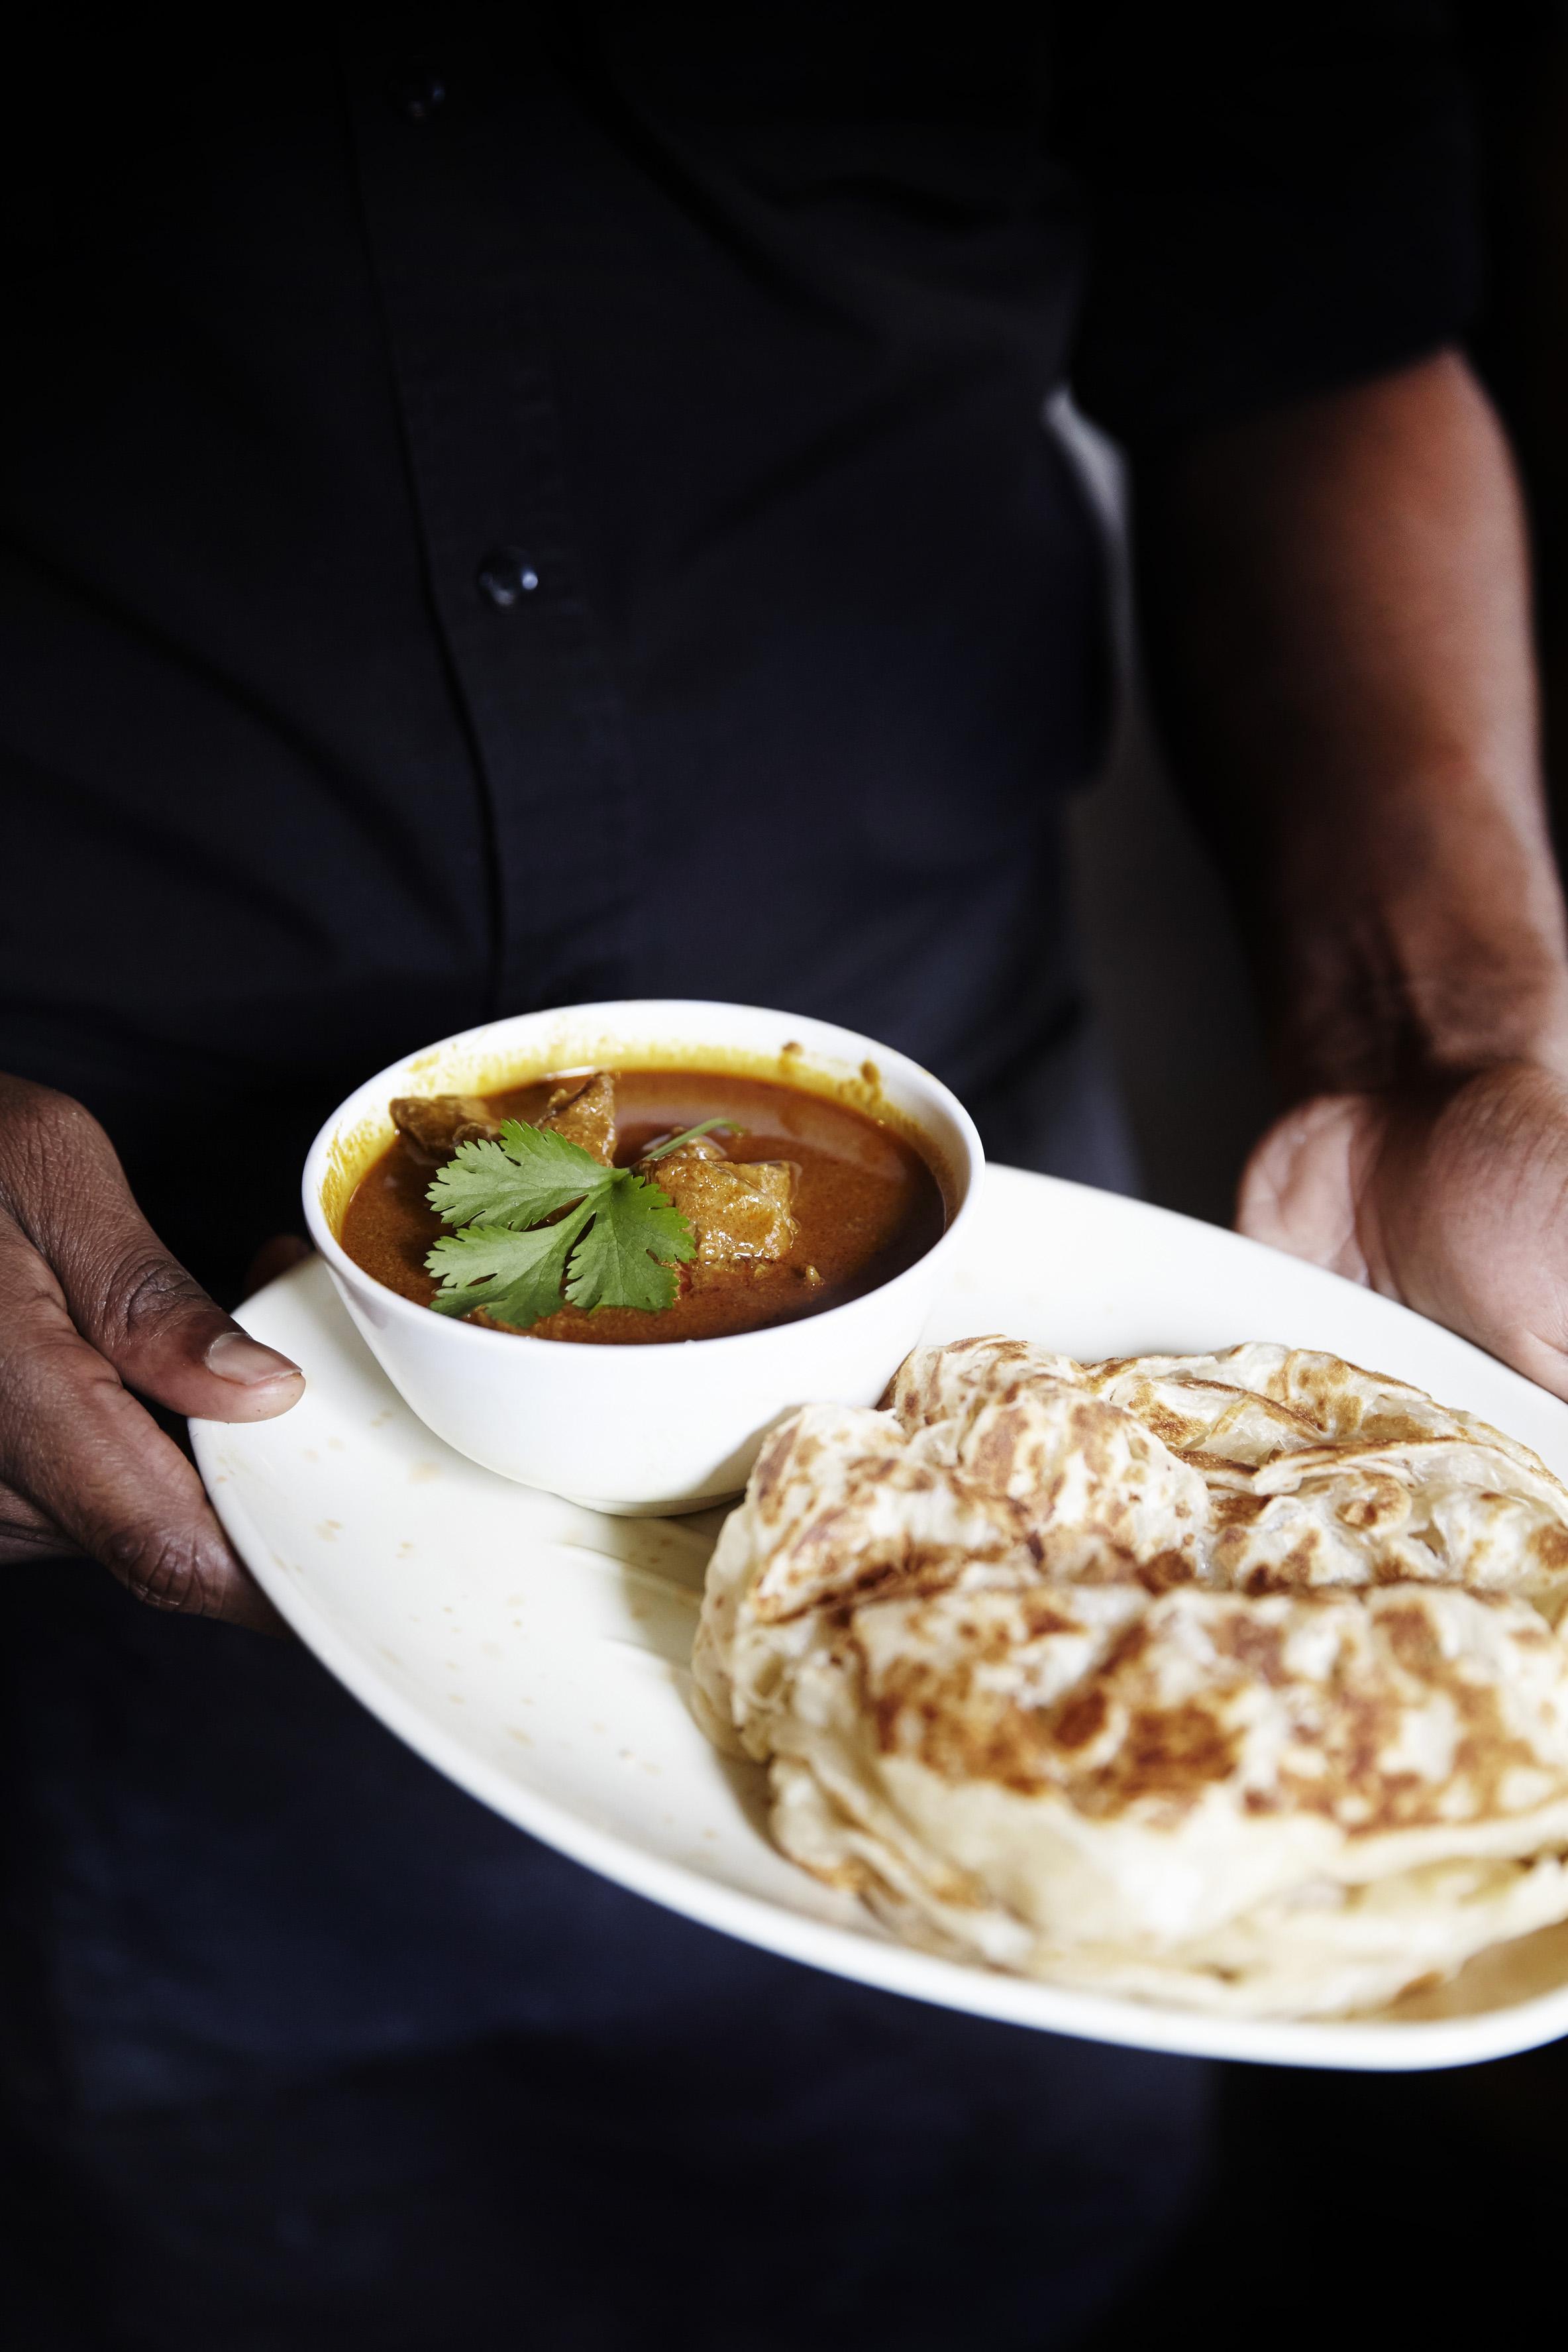 roti canai and daal at Roti King, a classic London restaurant